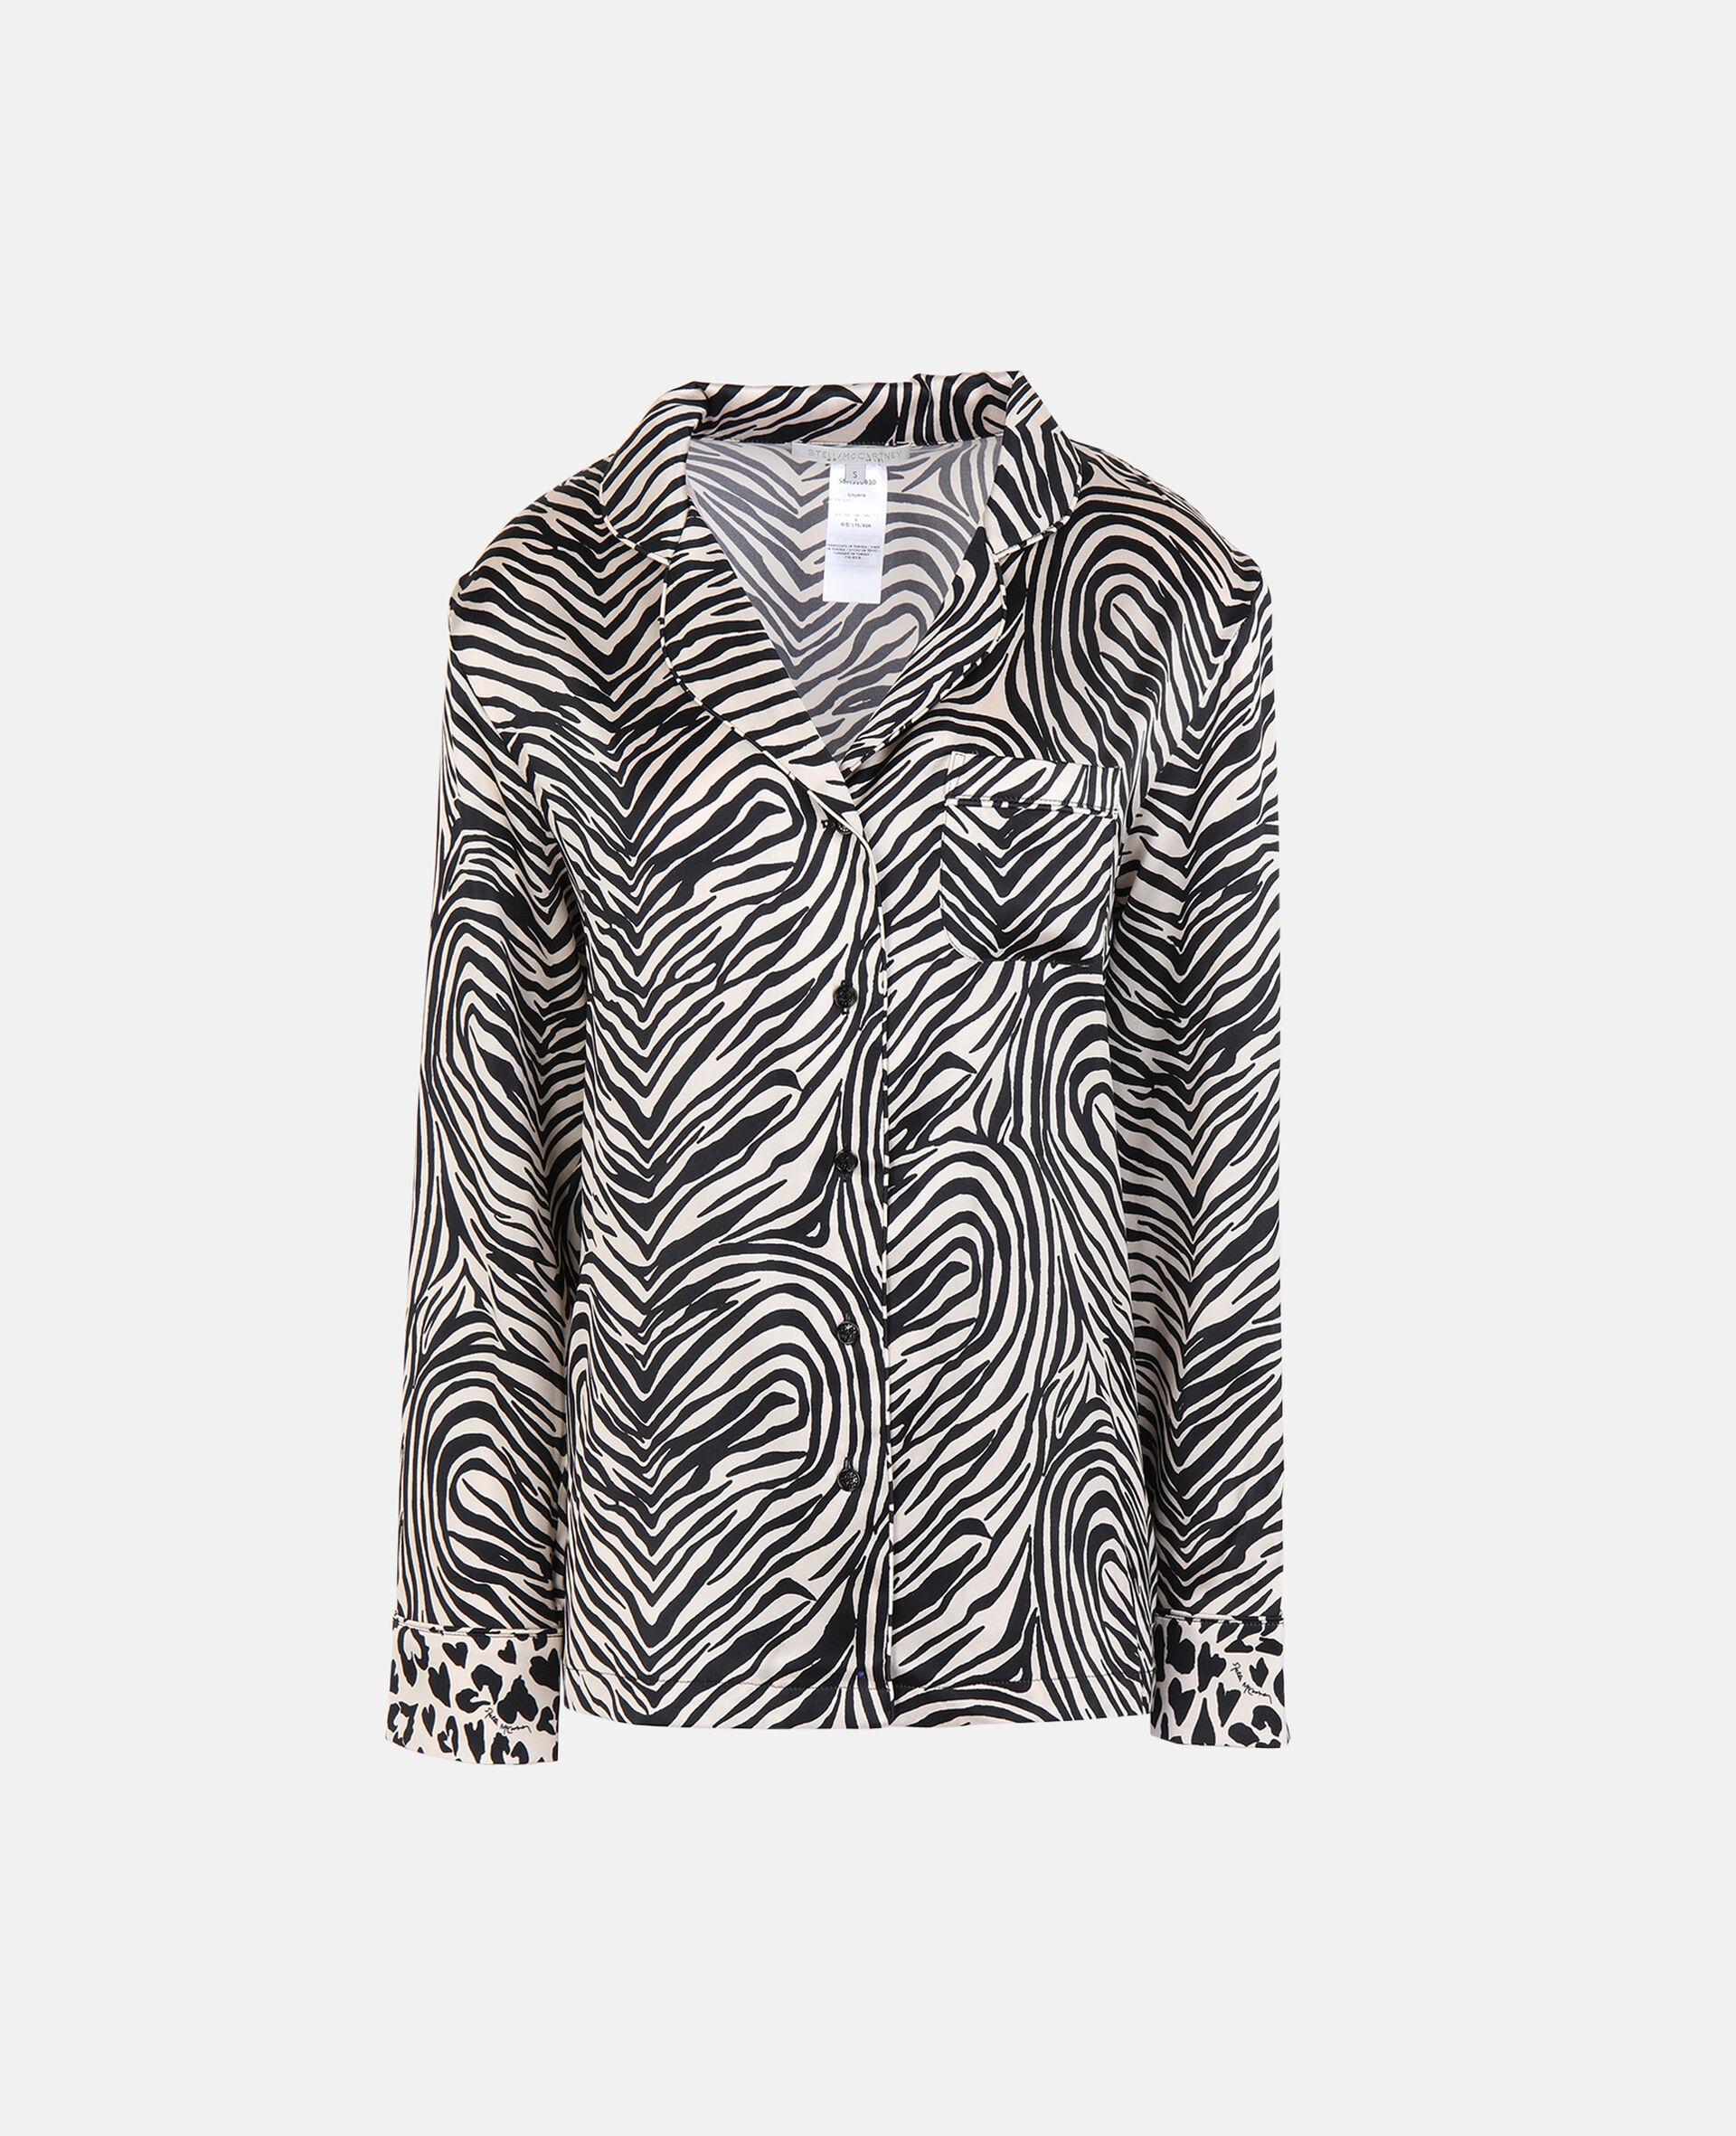 Maggie Twisting Shirt-Beige-large image number 0